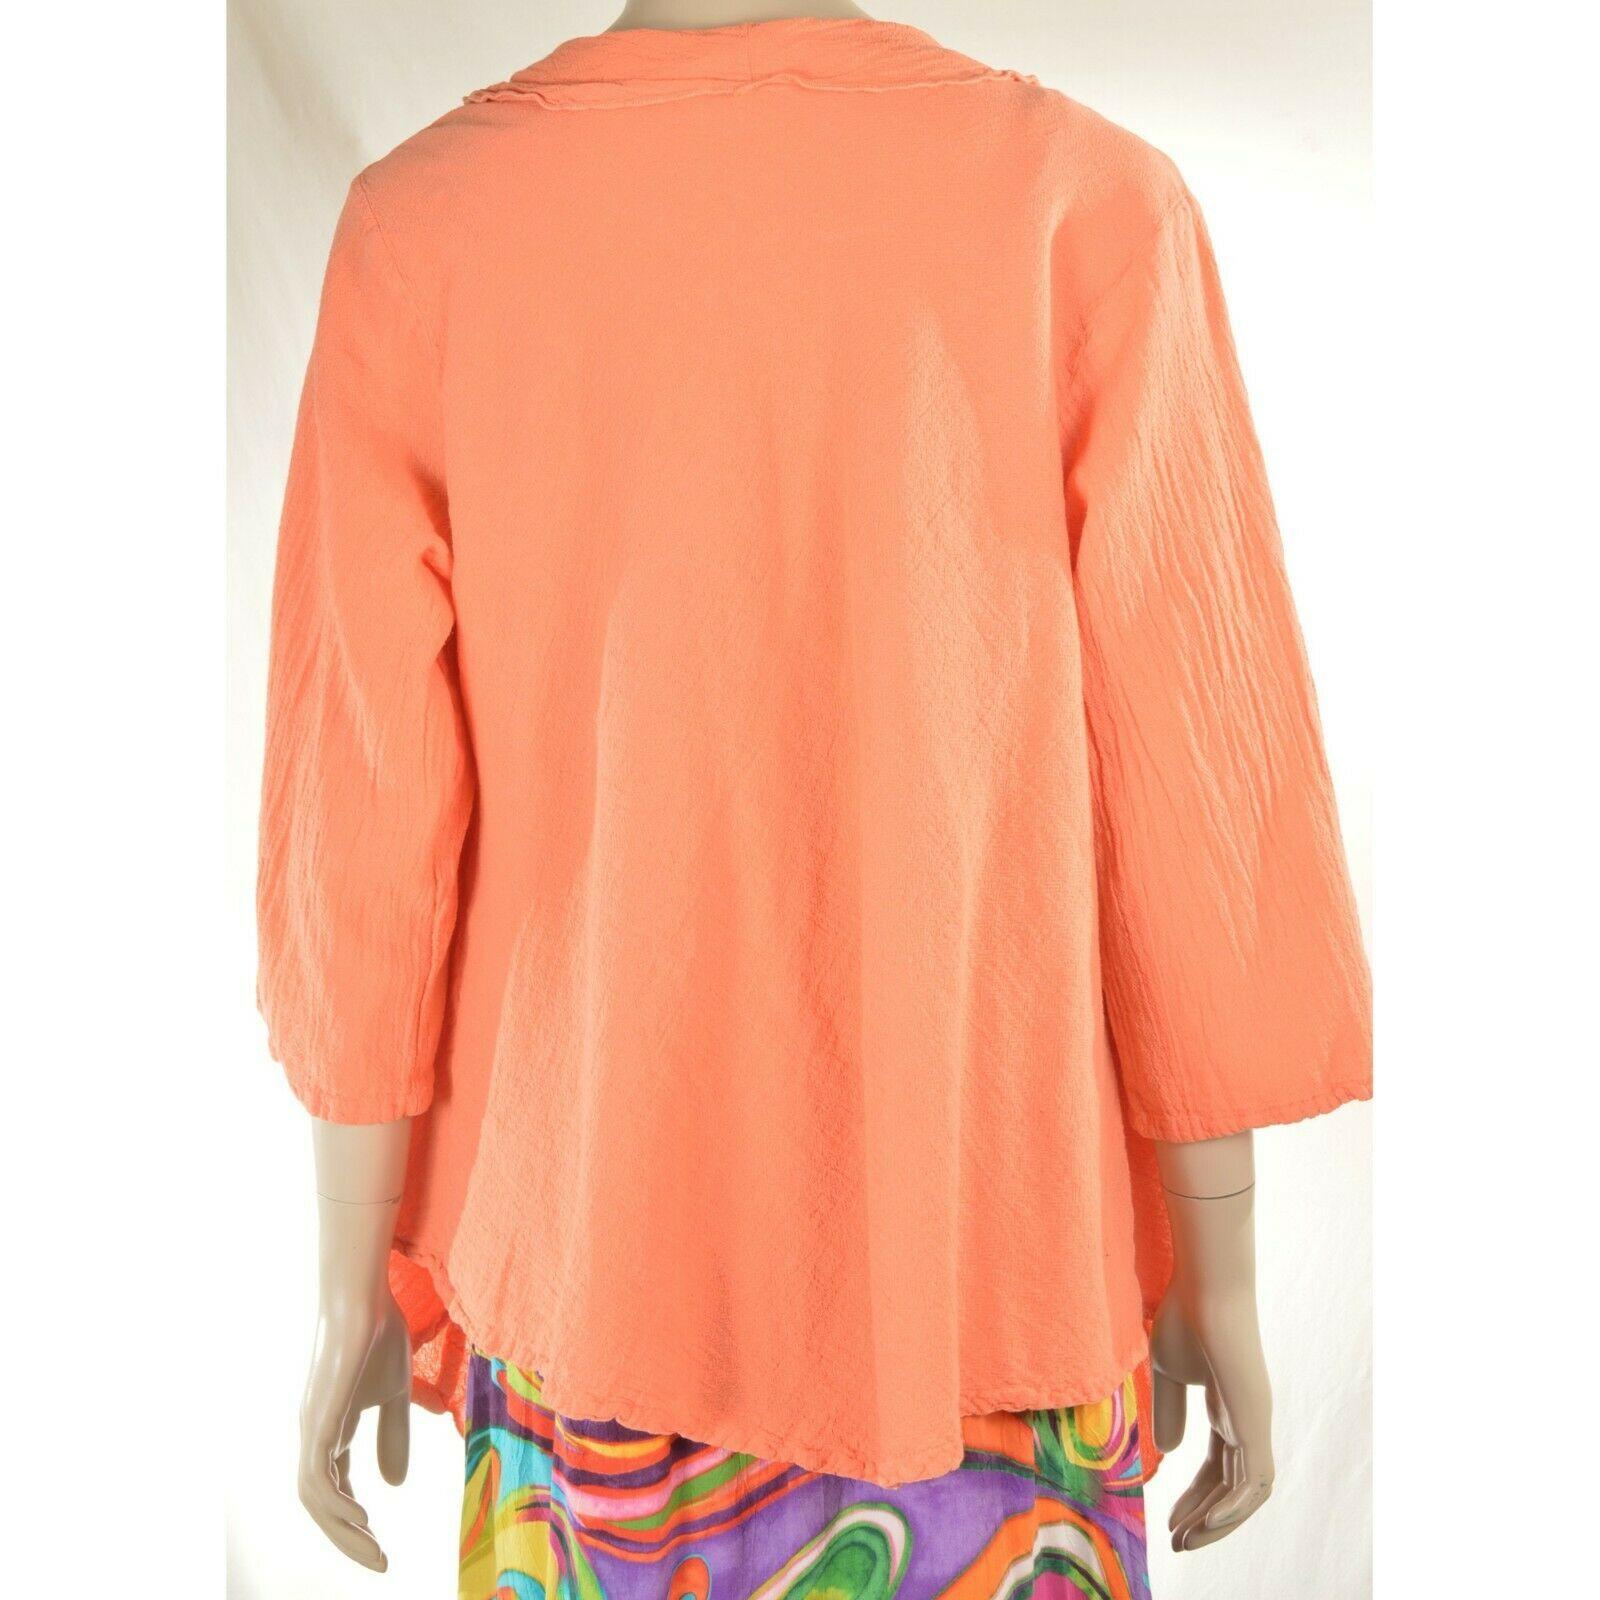 Oh My Gauge jacket cover open OS orange sherbet long sleeve ruffle front hi lo image 7